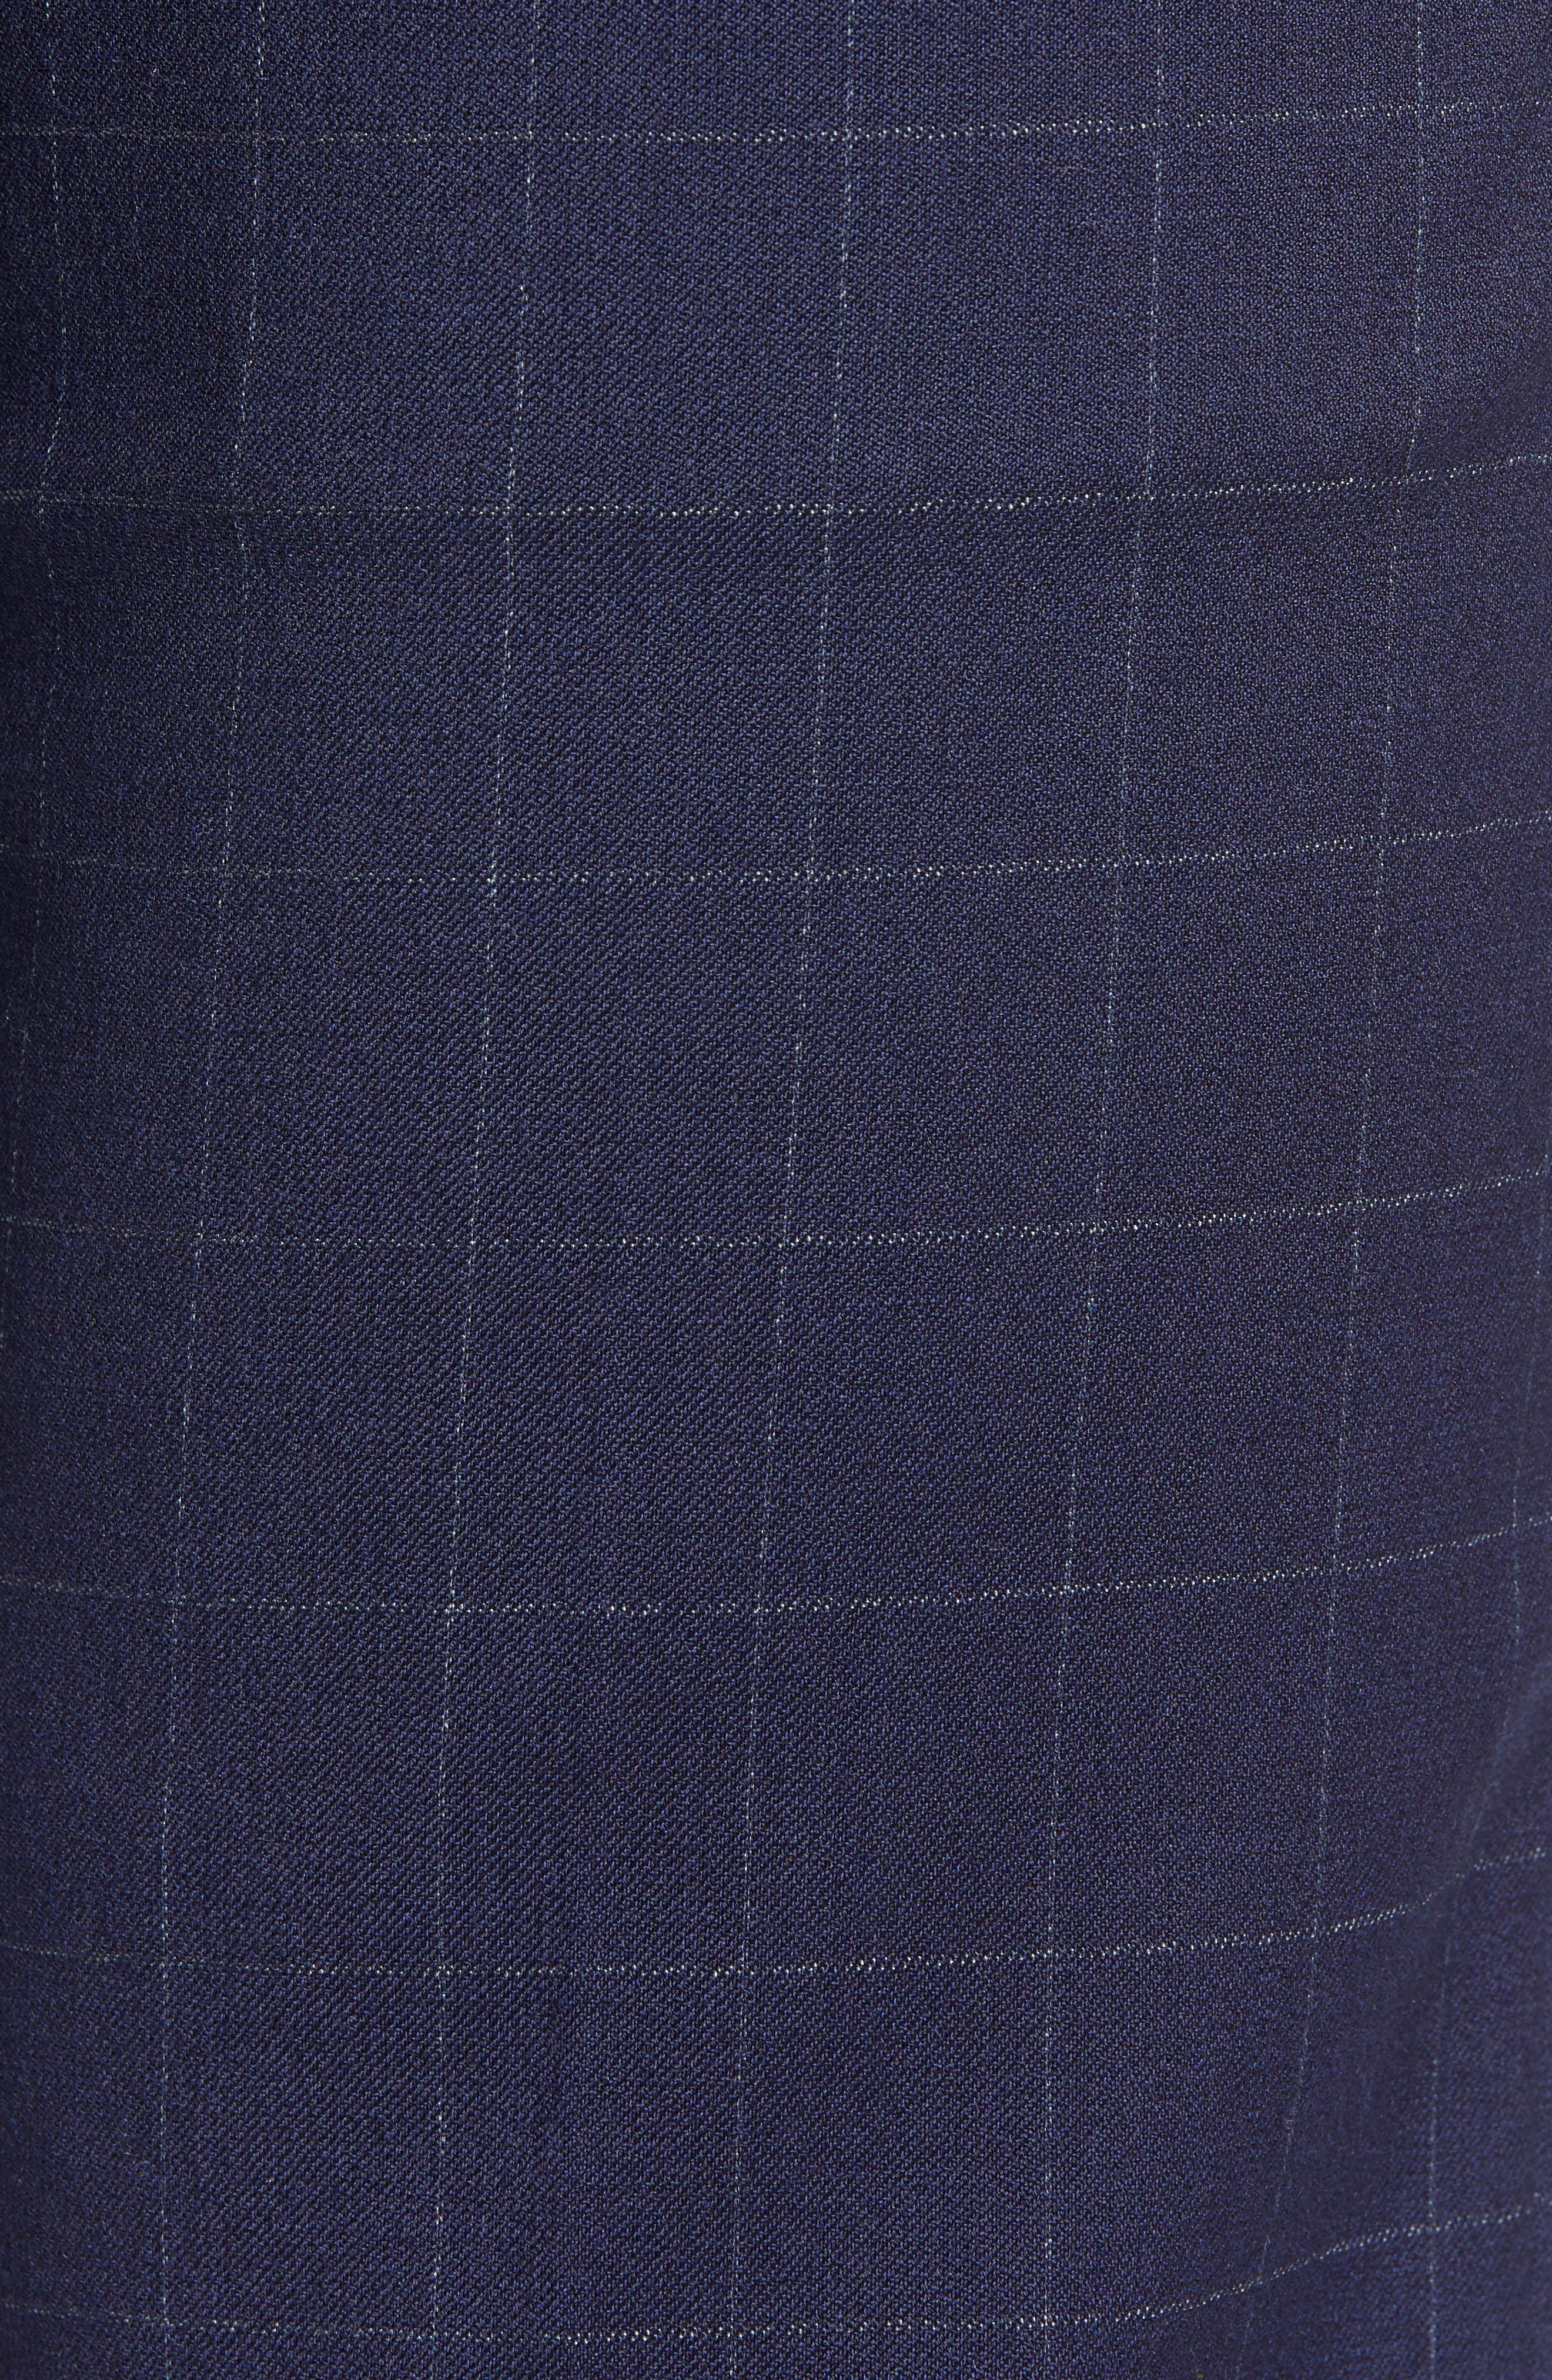 BONOBOS, Jetsetter Slim Fit Stretch Suit Pants, Alternate thumbnail 5, color, NAVY CHALK WINDOWPANE